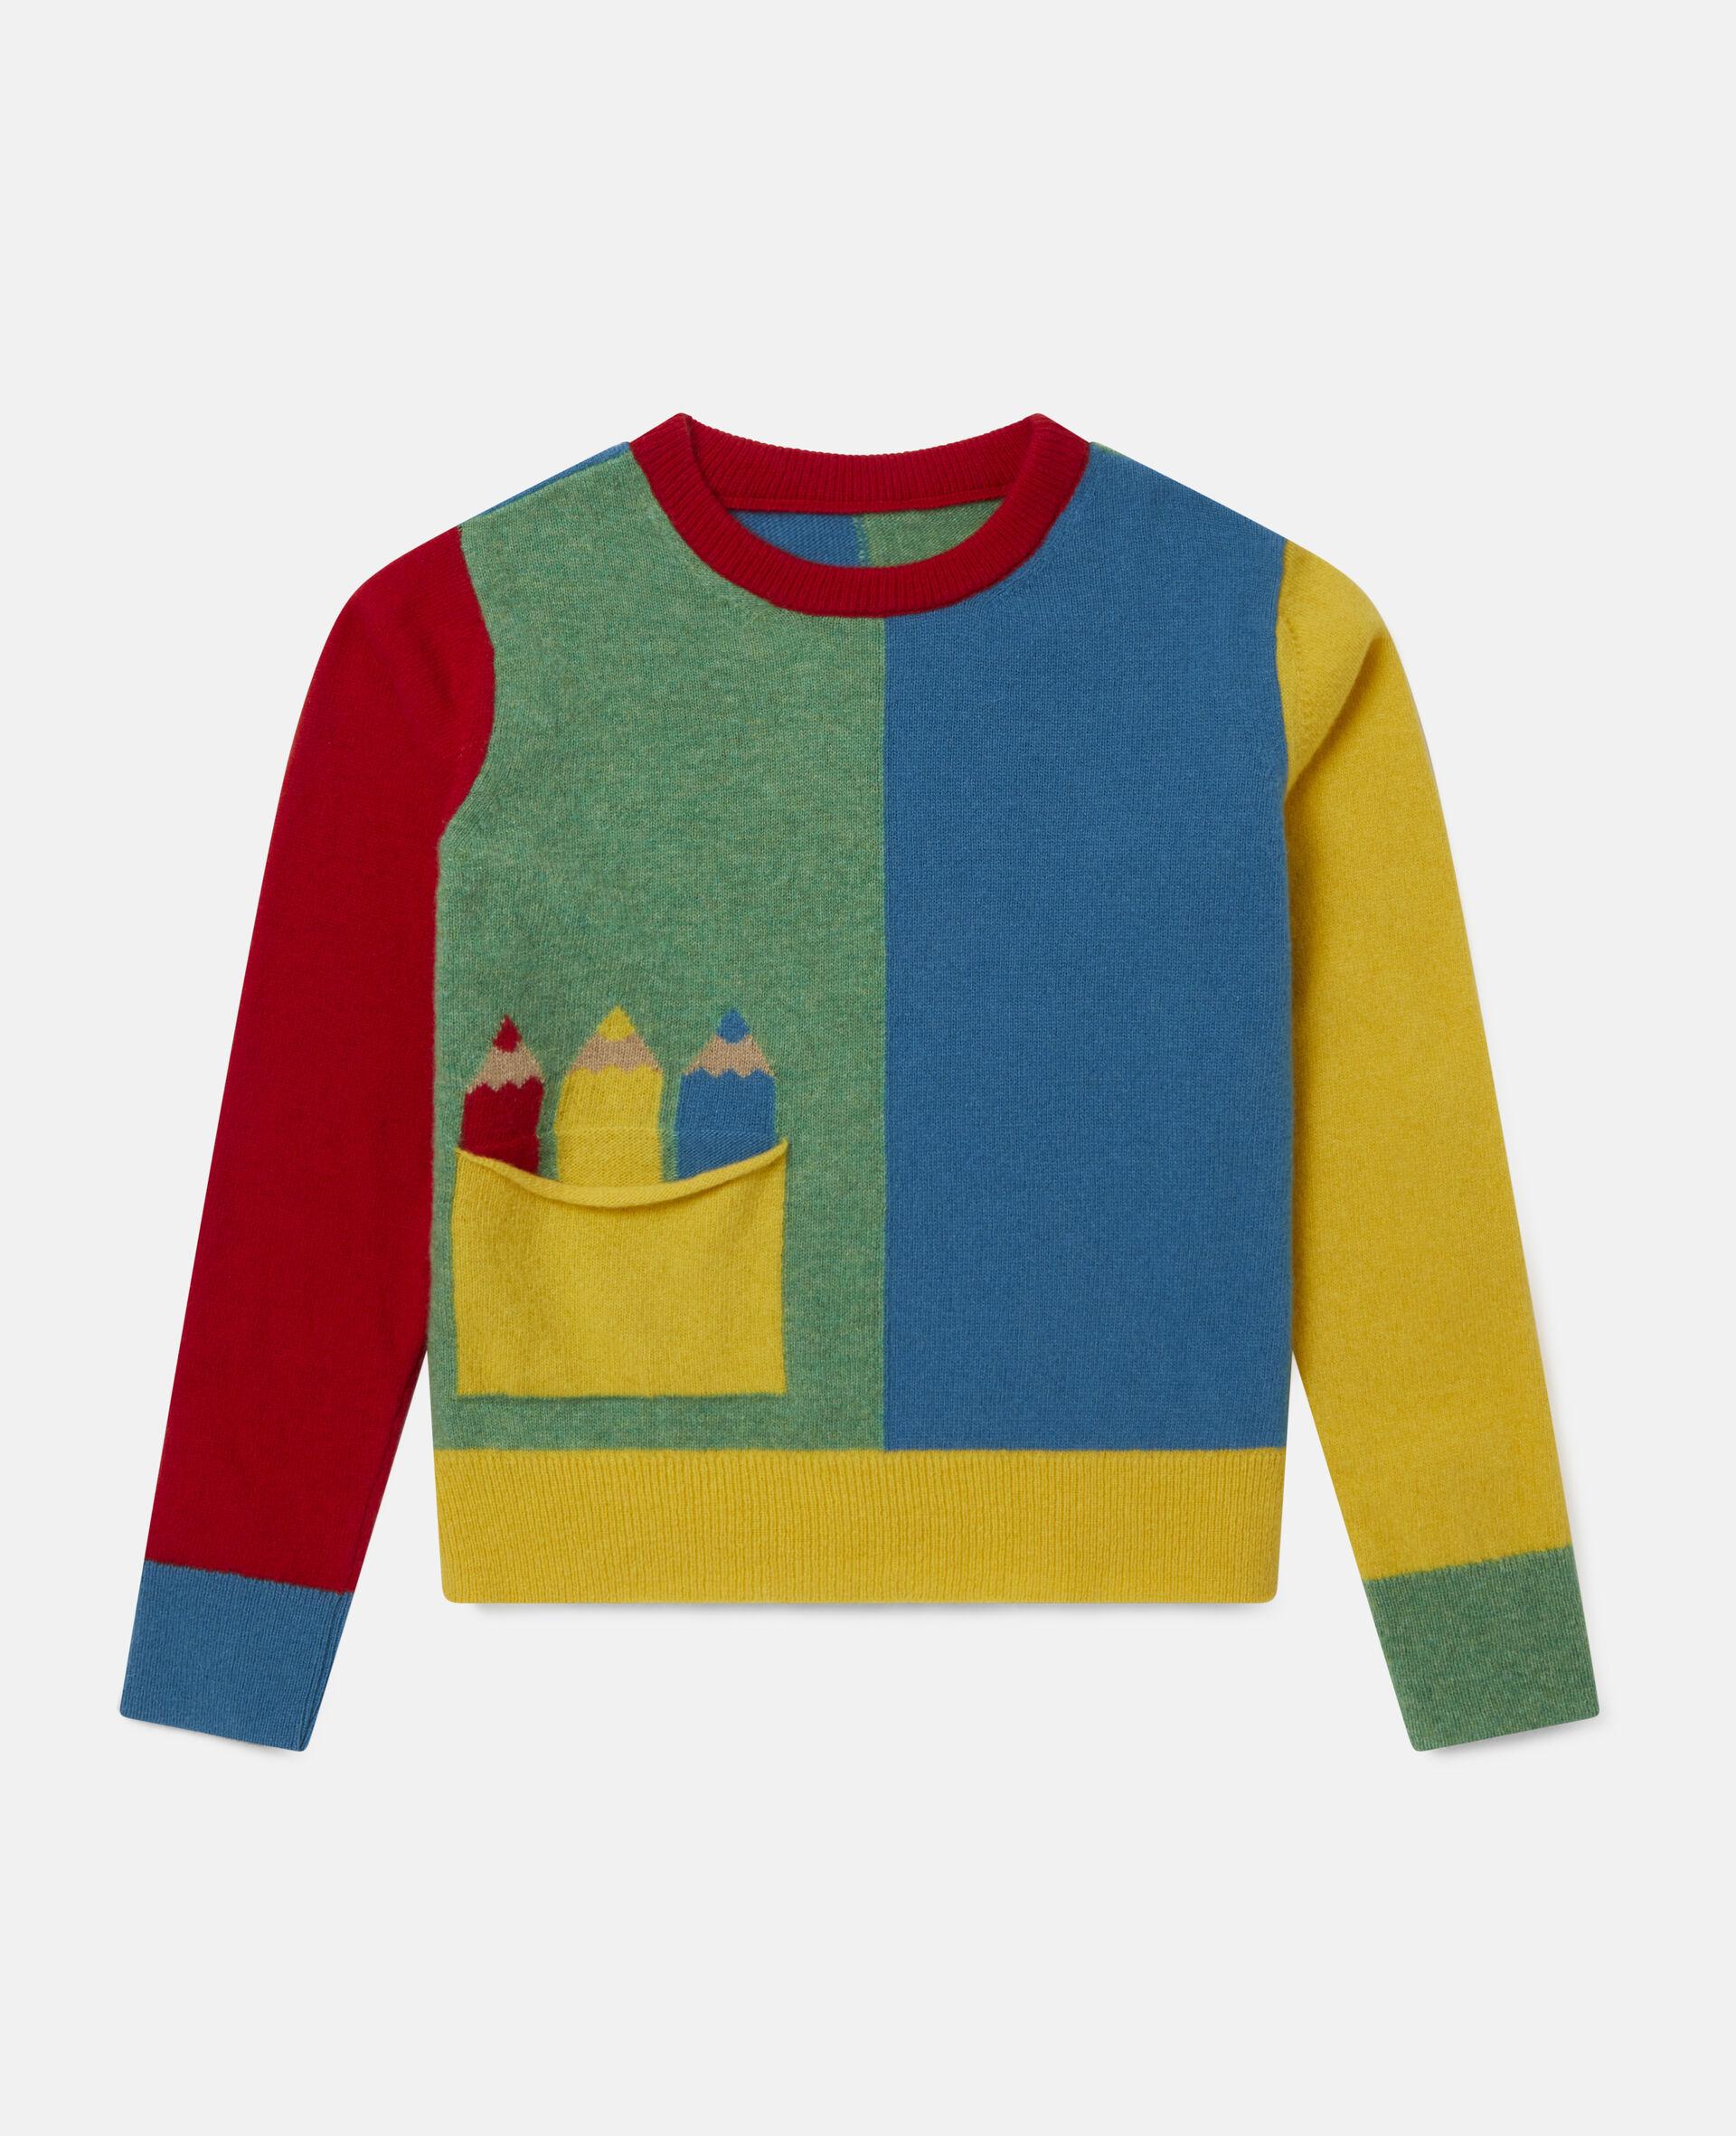 Colourblock Knit Intarsia Jumper -Multicolour-large image number 0